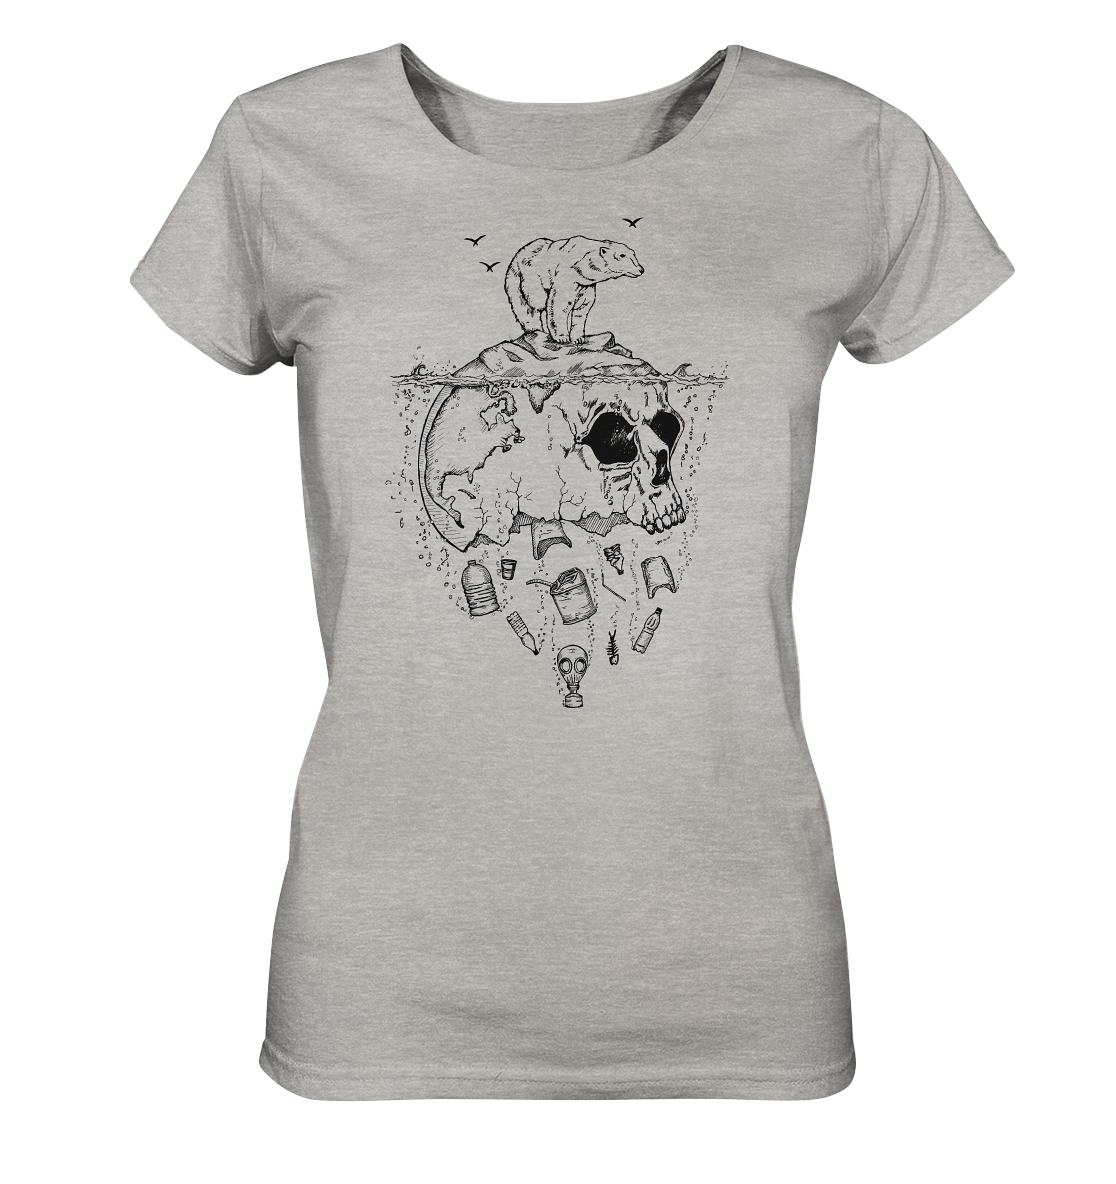 front-ladies-organic-shirt-meliert-c2c1c0-1116x-3.png